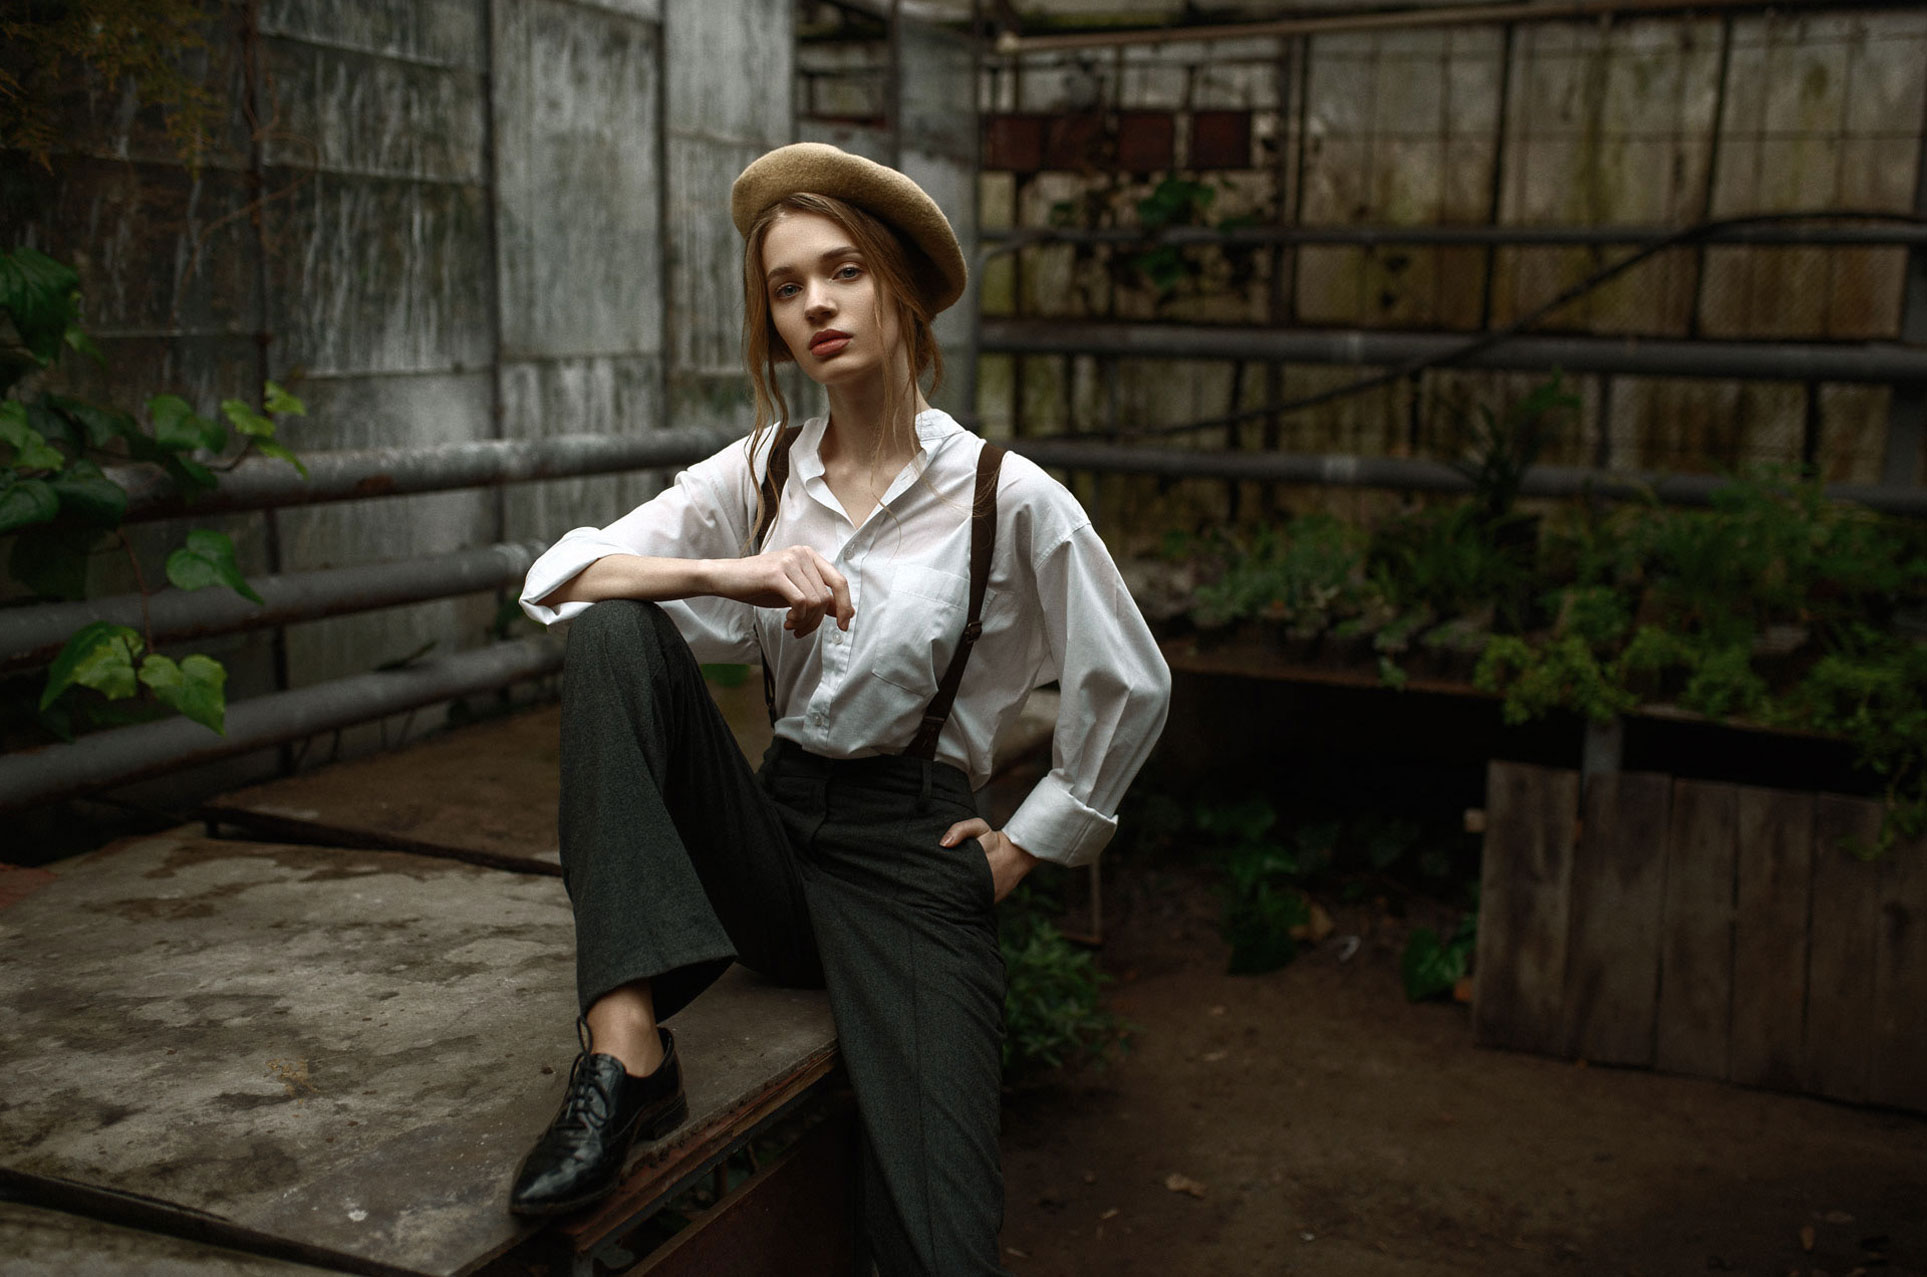 Полина Воропаева / Polina Voropaieva by Maks Kuzin